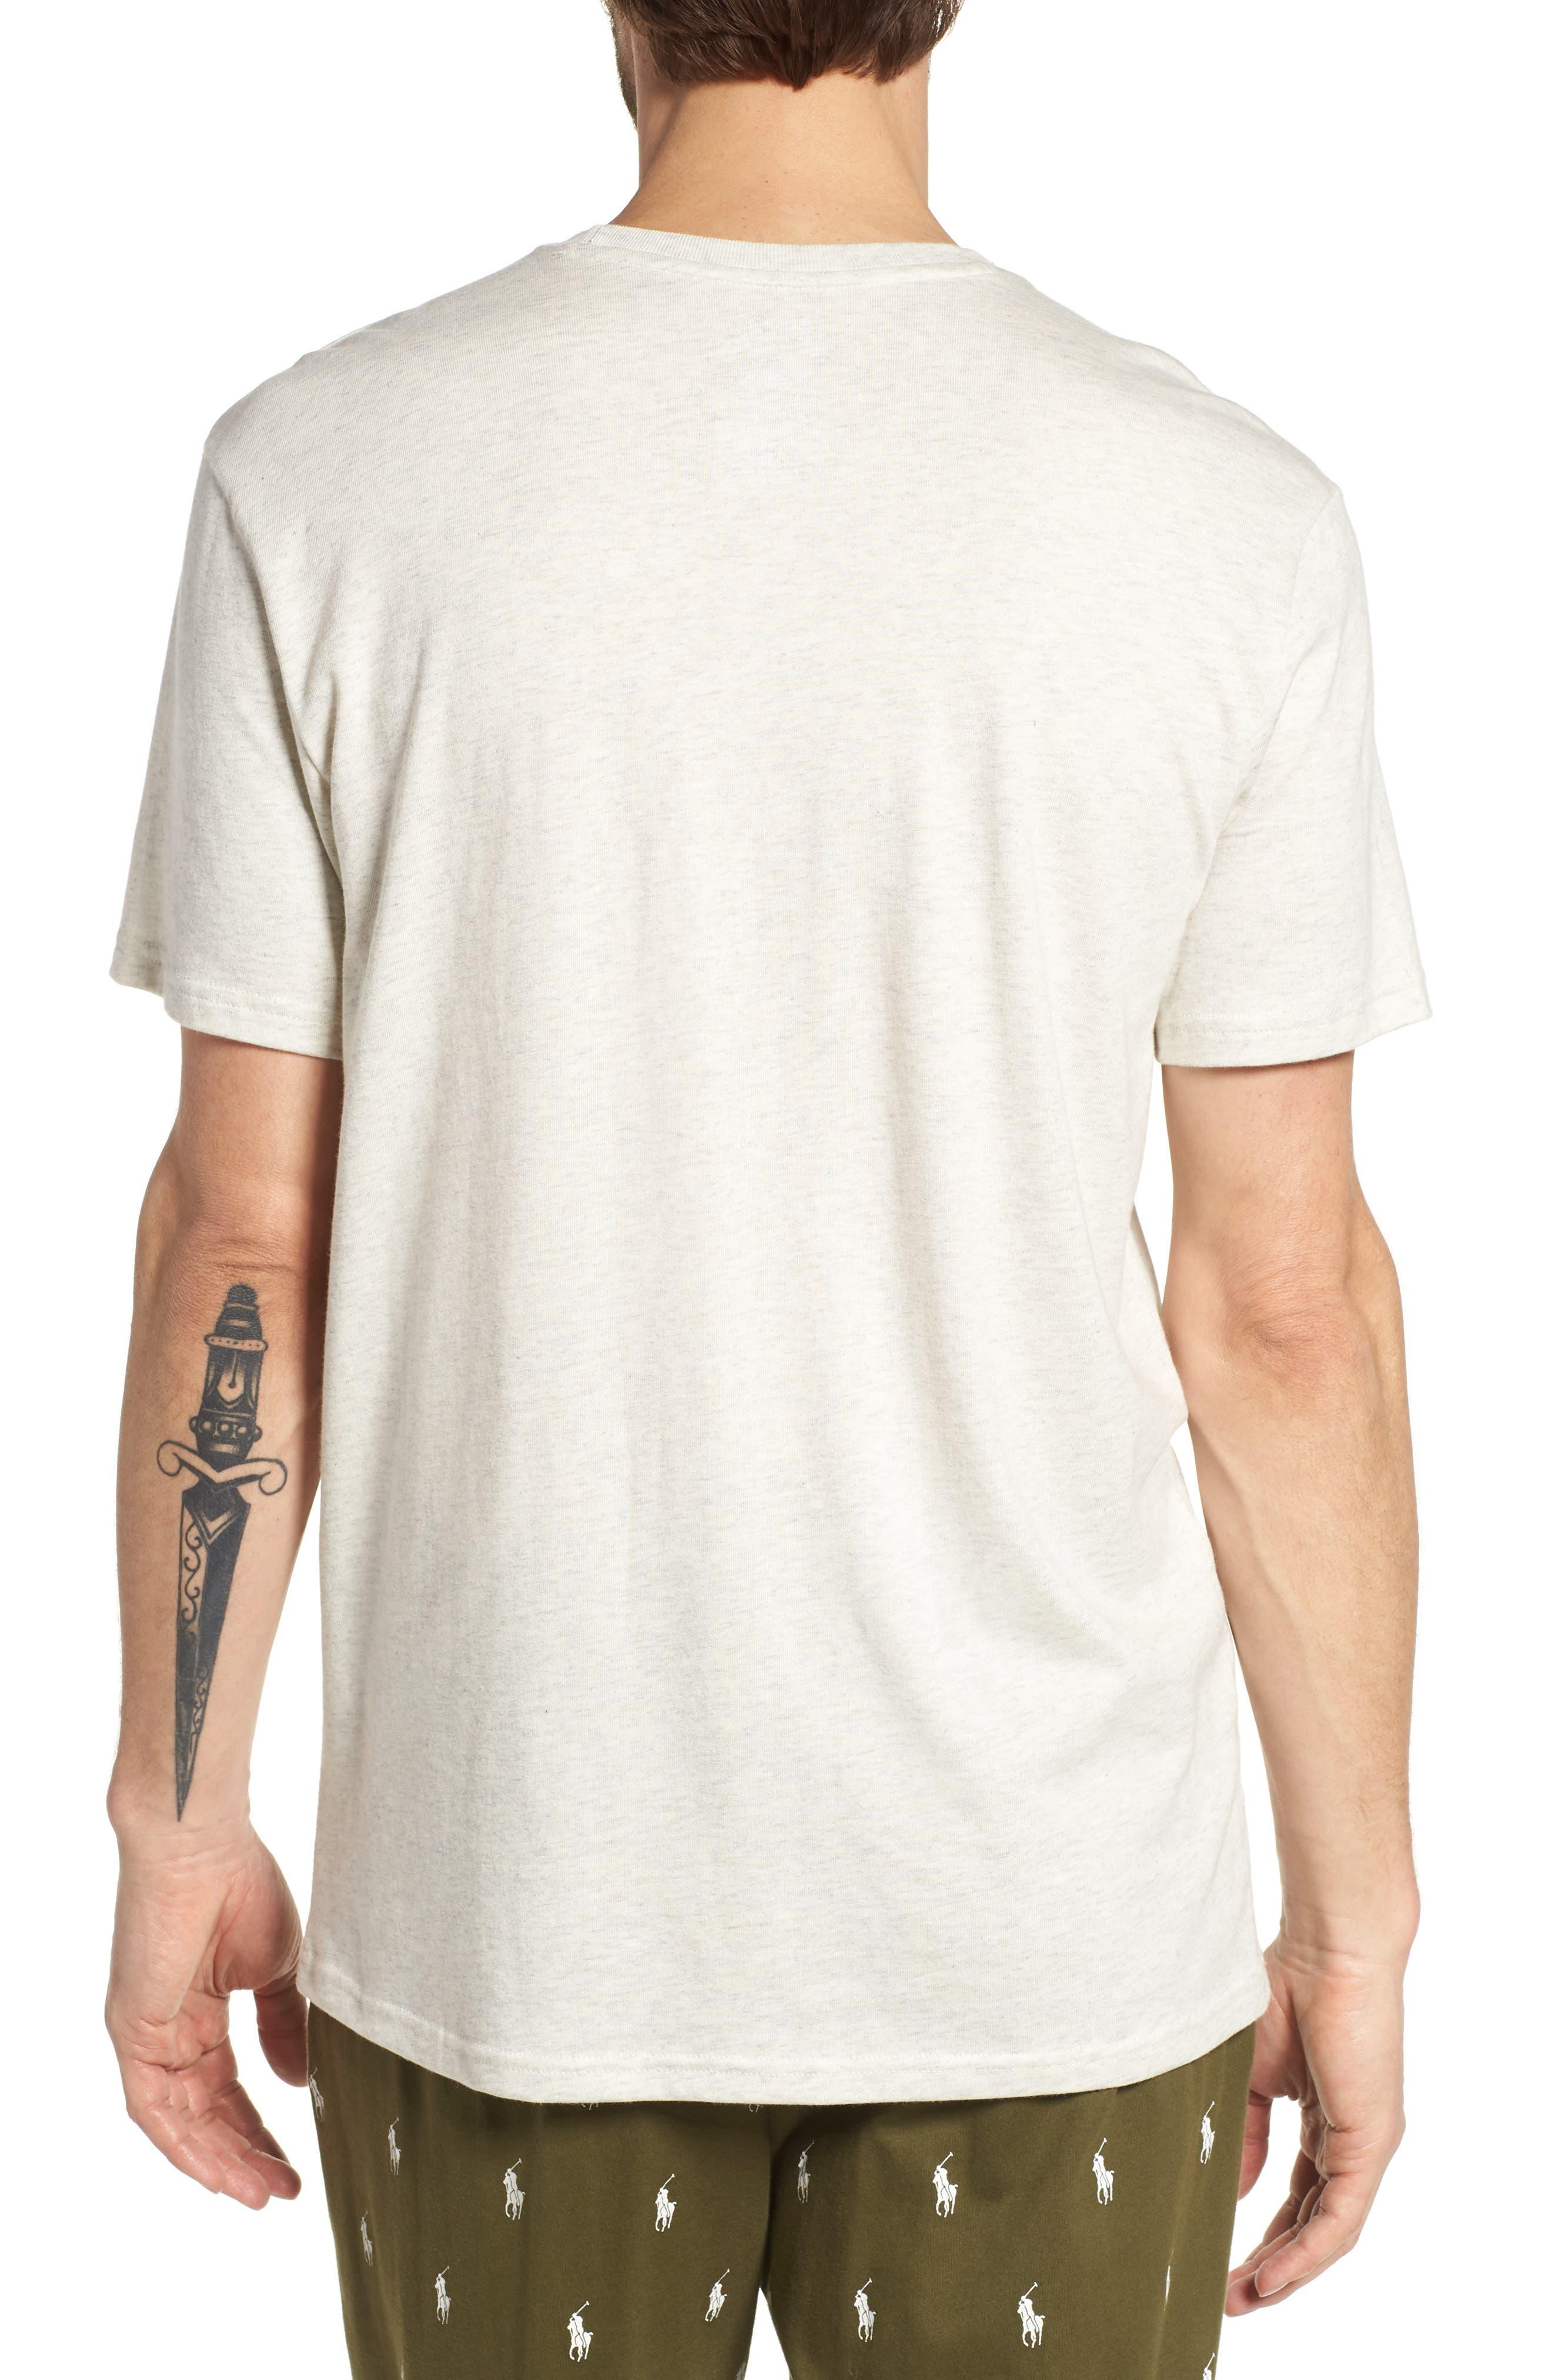 Supreme Comfort Crewneck T-Shirt,                             Alternate thumbnail 2, color,                             Sand Heather/ Bright Navy